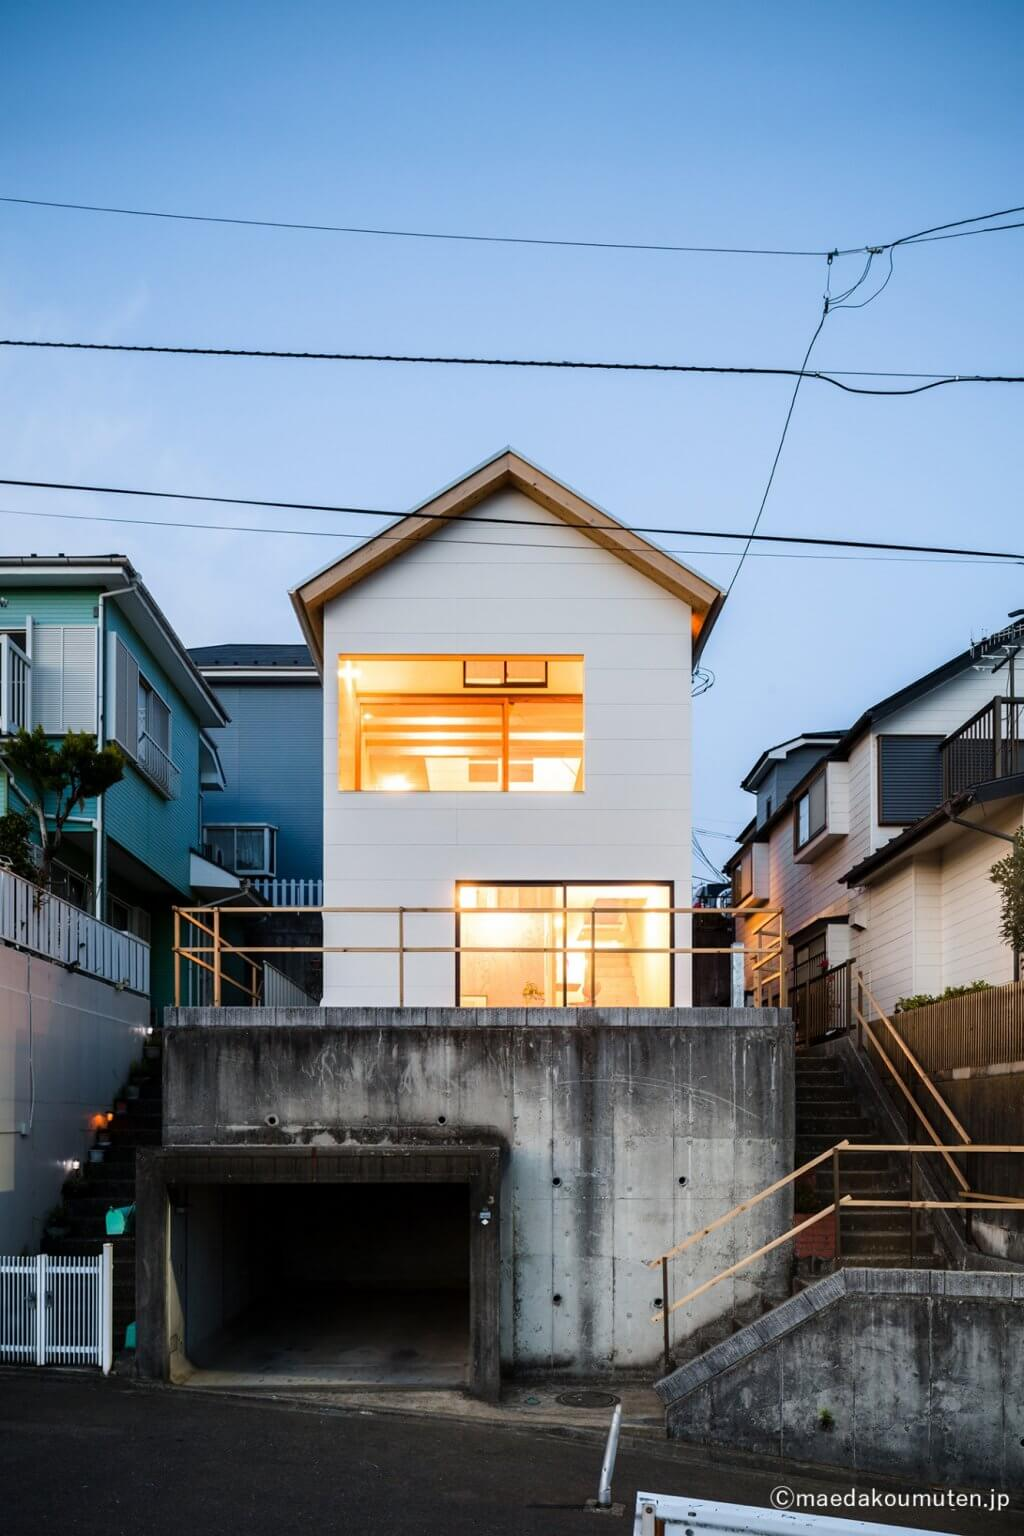 神奈川、工務店、注文住宅、デザイン住宅、建築家、磯部の家、37